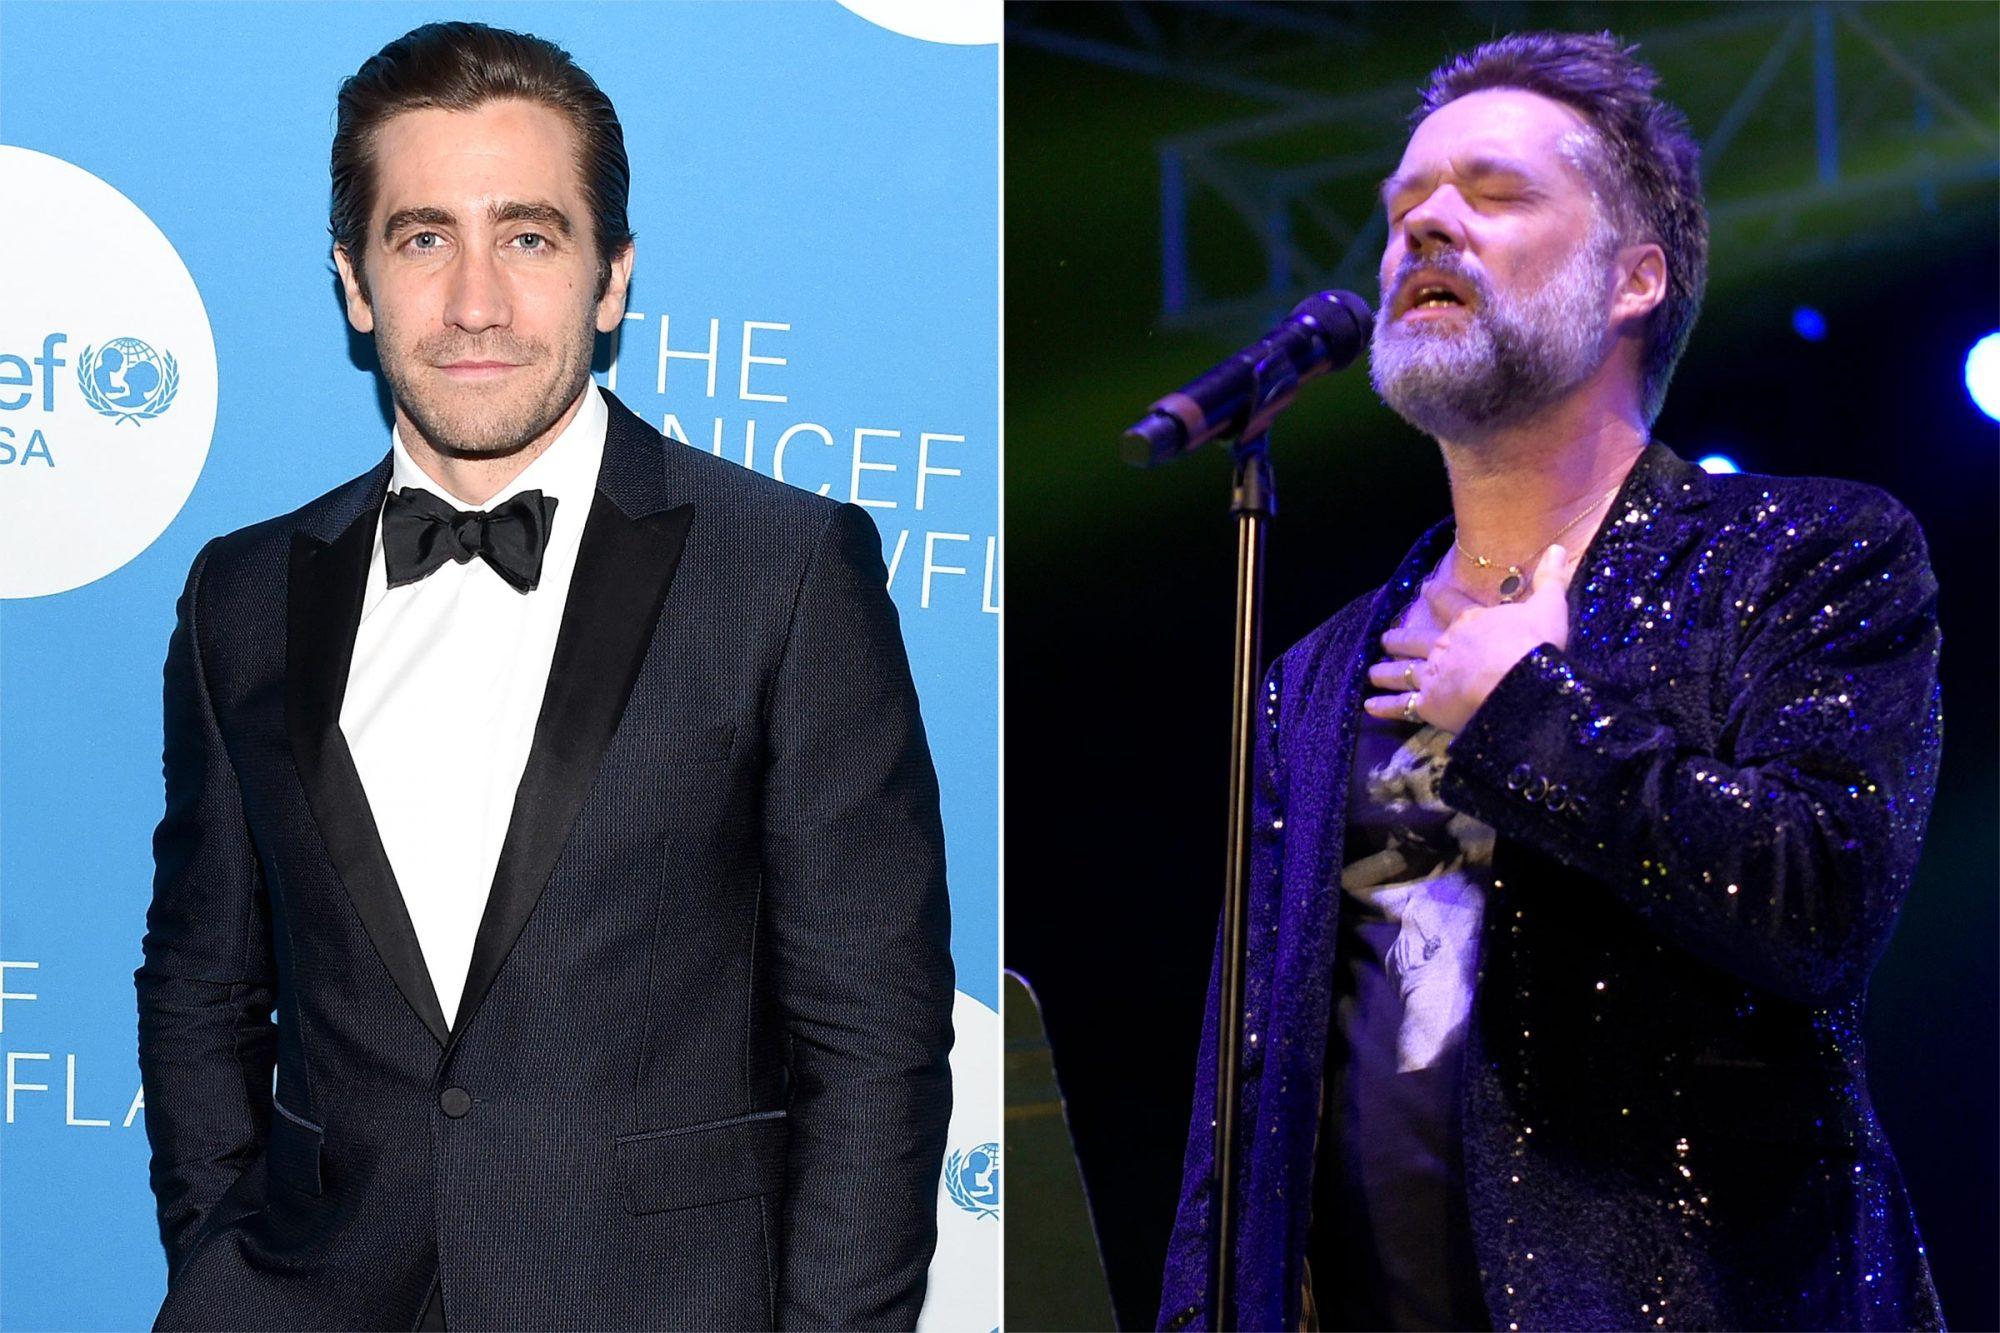 Jake Gyllenhaal / Rufus Wainwright